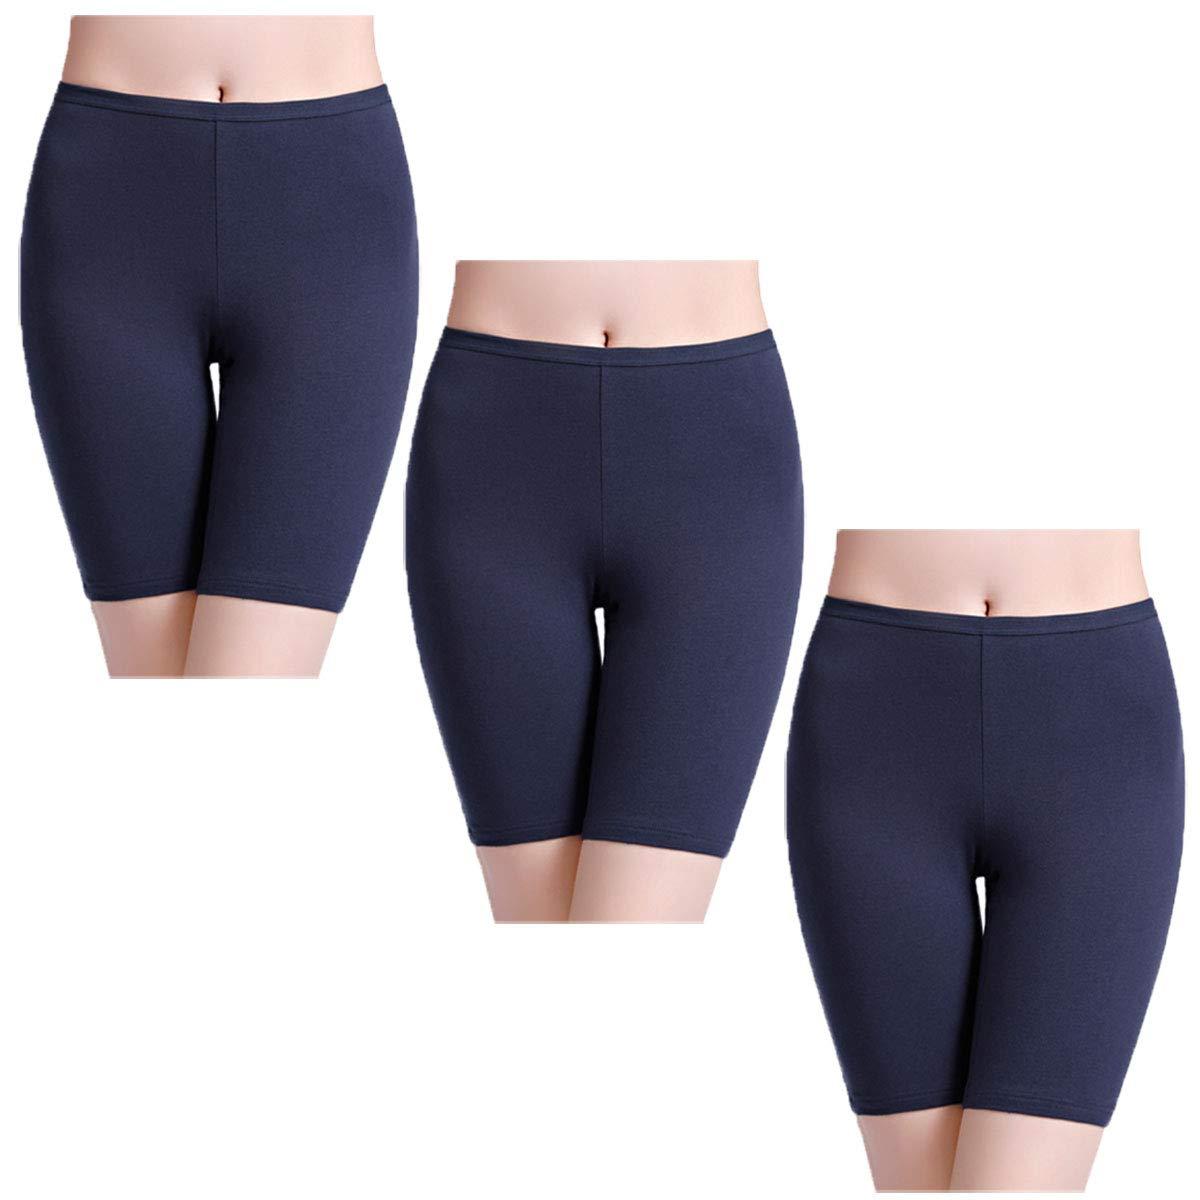 wirarpa Women's Shorts High Rise Cotton Knickers 3 Pack Anti Chafing Underwear Comfortable Cycling Running Gym Boyshorts Leggings Under Dresses Size S-XXL W-Boy Shorts-01